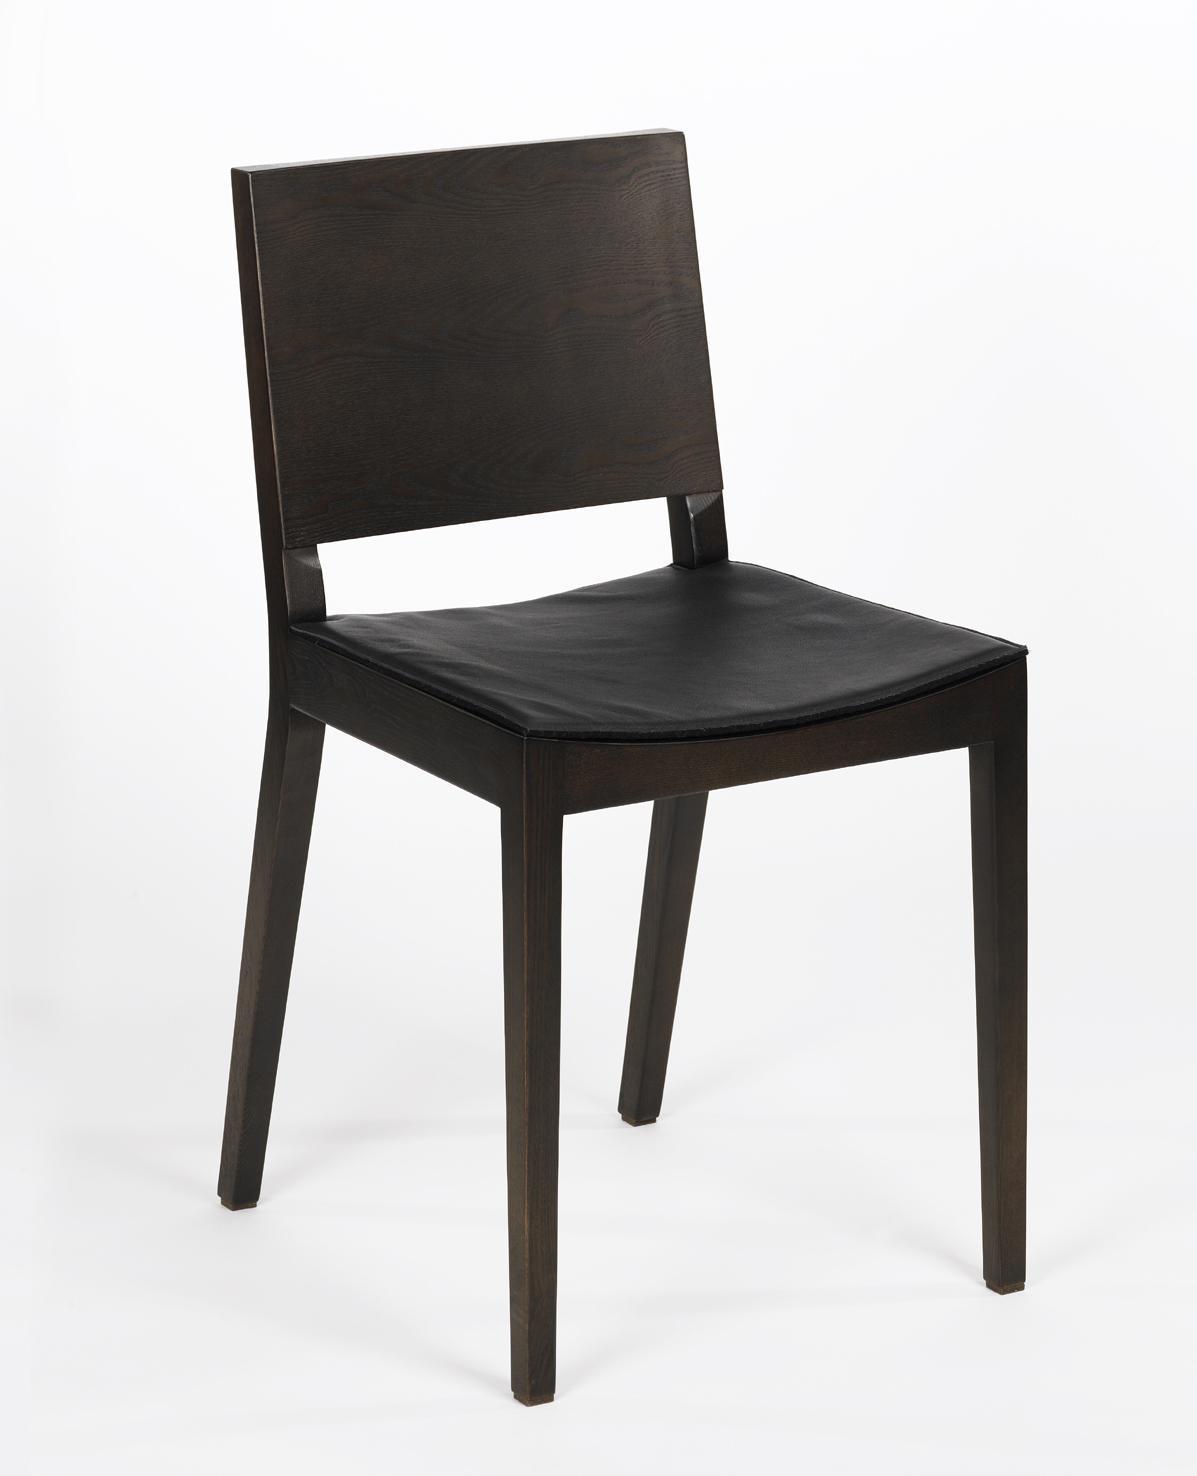 Sedie da Pranzo/Cena, Design, 100.0 - 200.0 pezzi al mese